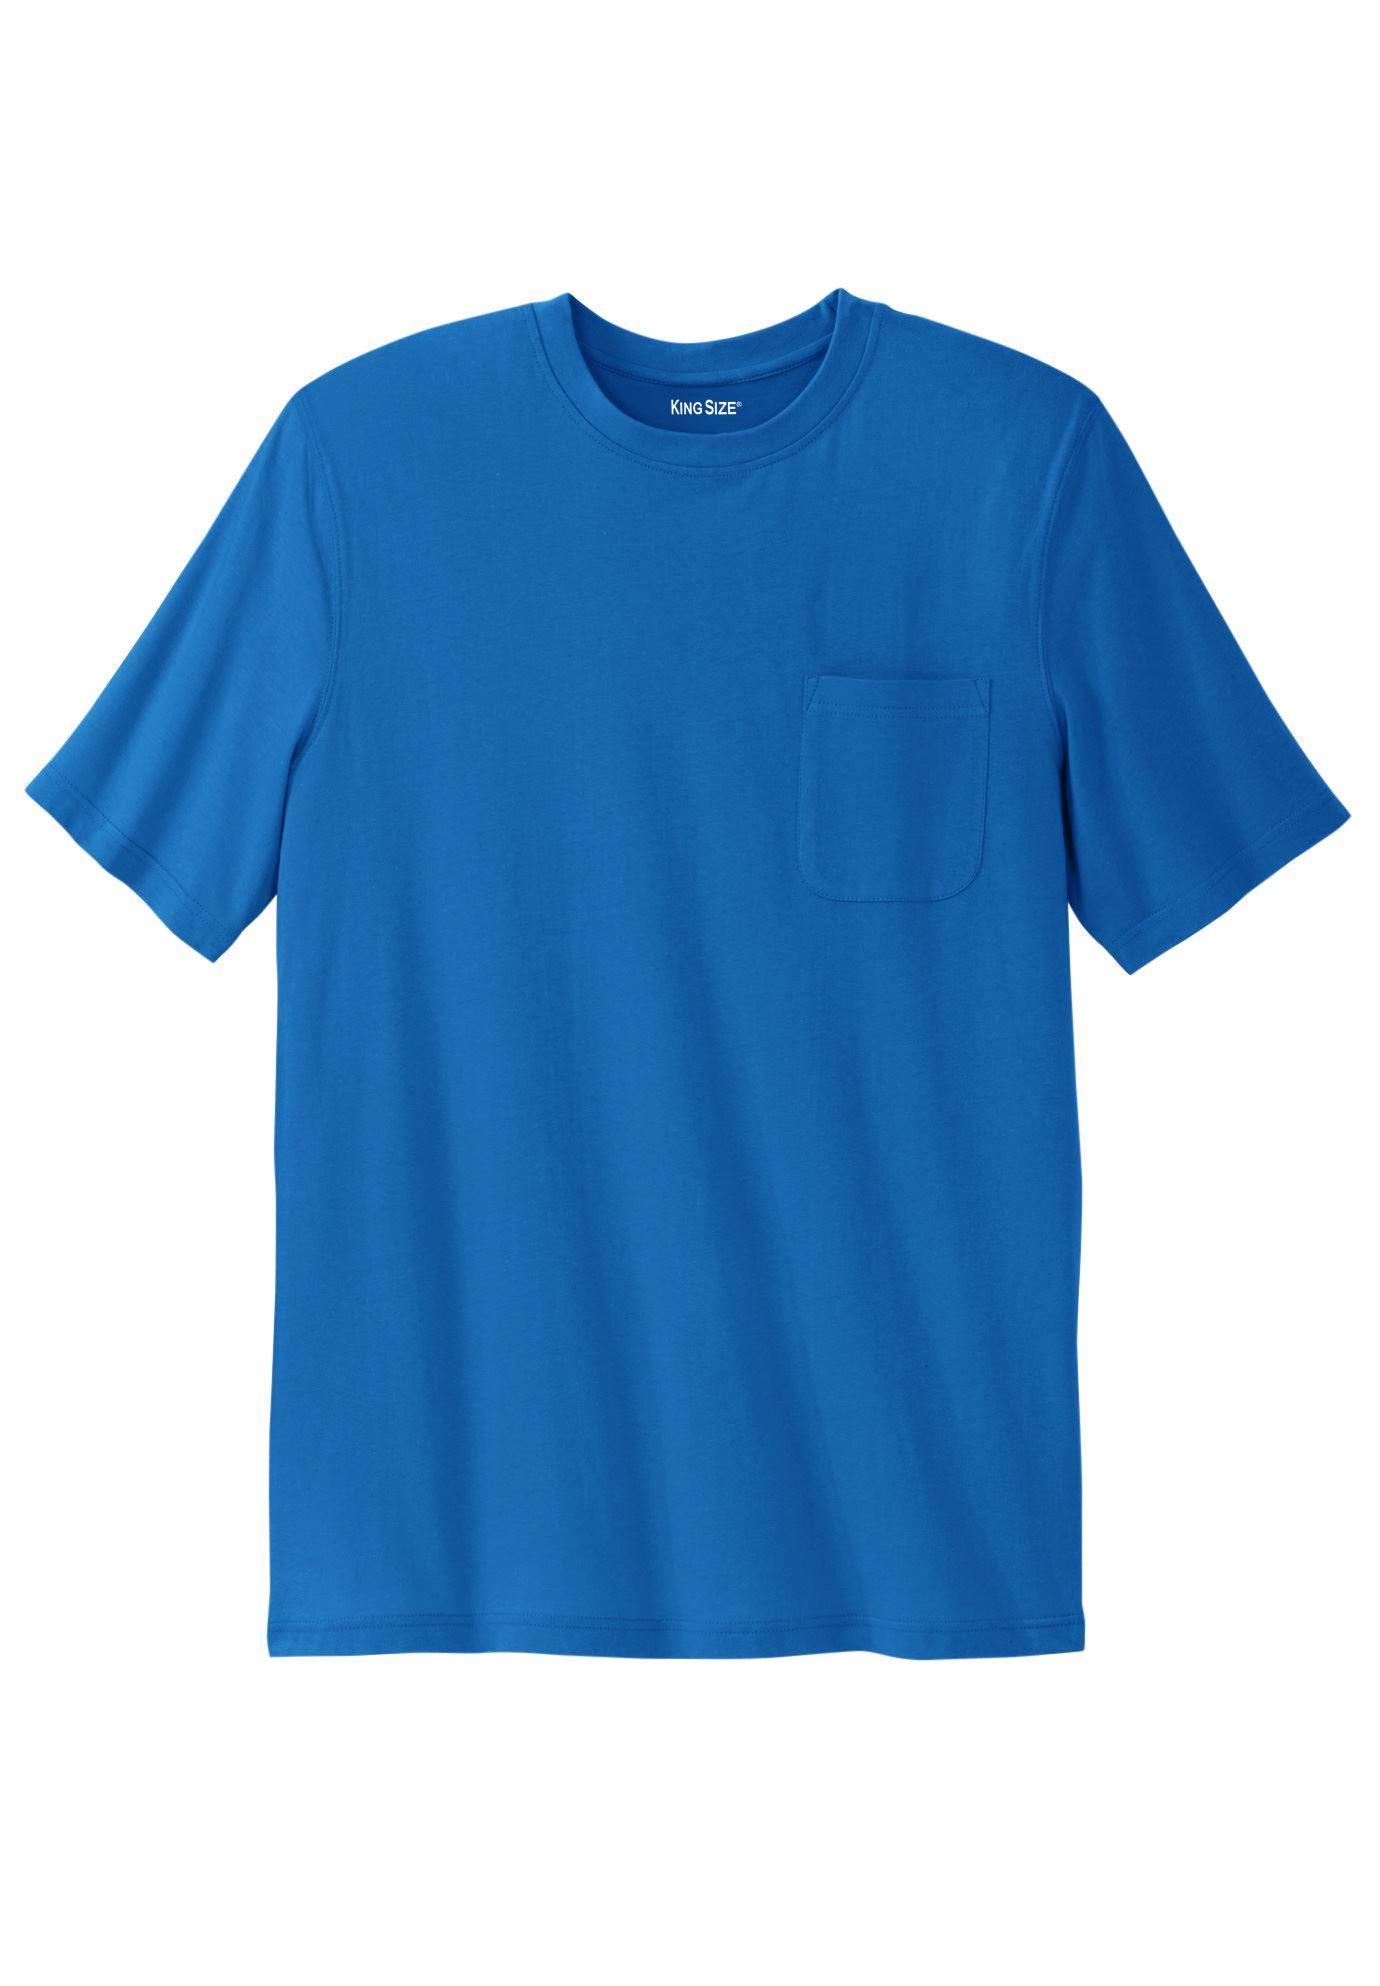 Kingsize Men's Big & Tall Lightweight Pocket Crewneck T-shirt